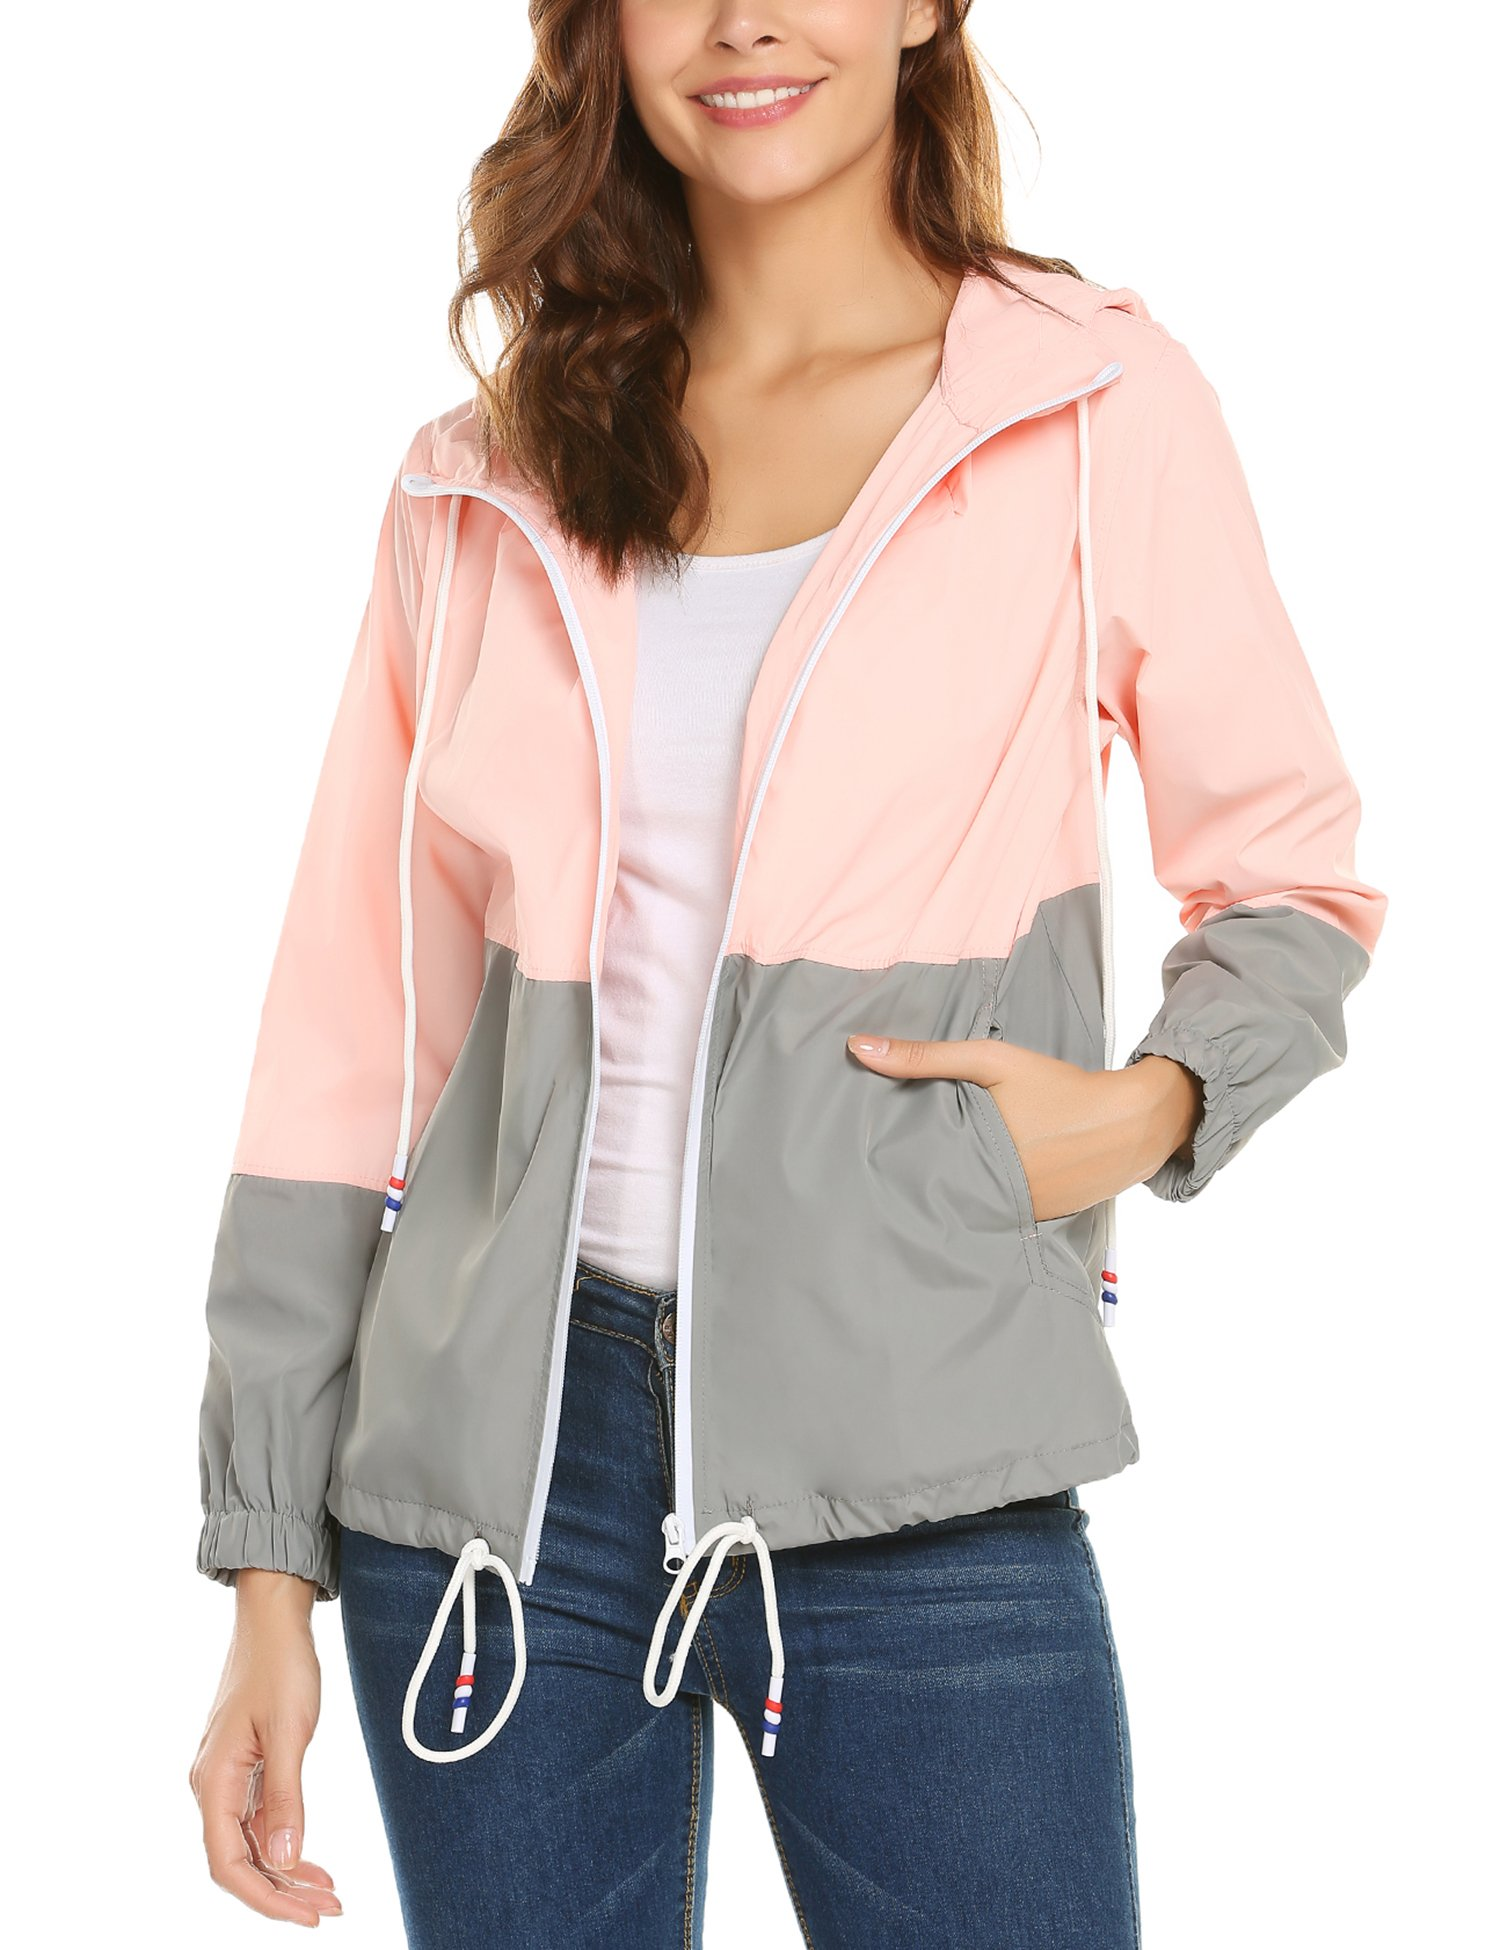 ZHENWEI Women's Lightweight Raincoat Zip up Casual Hoodie Rain Jacket Pink L by ZHENWEI (Image #4)